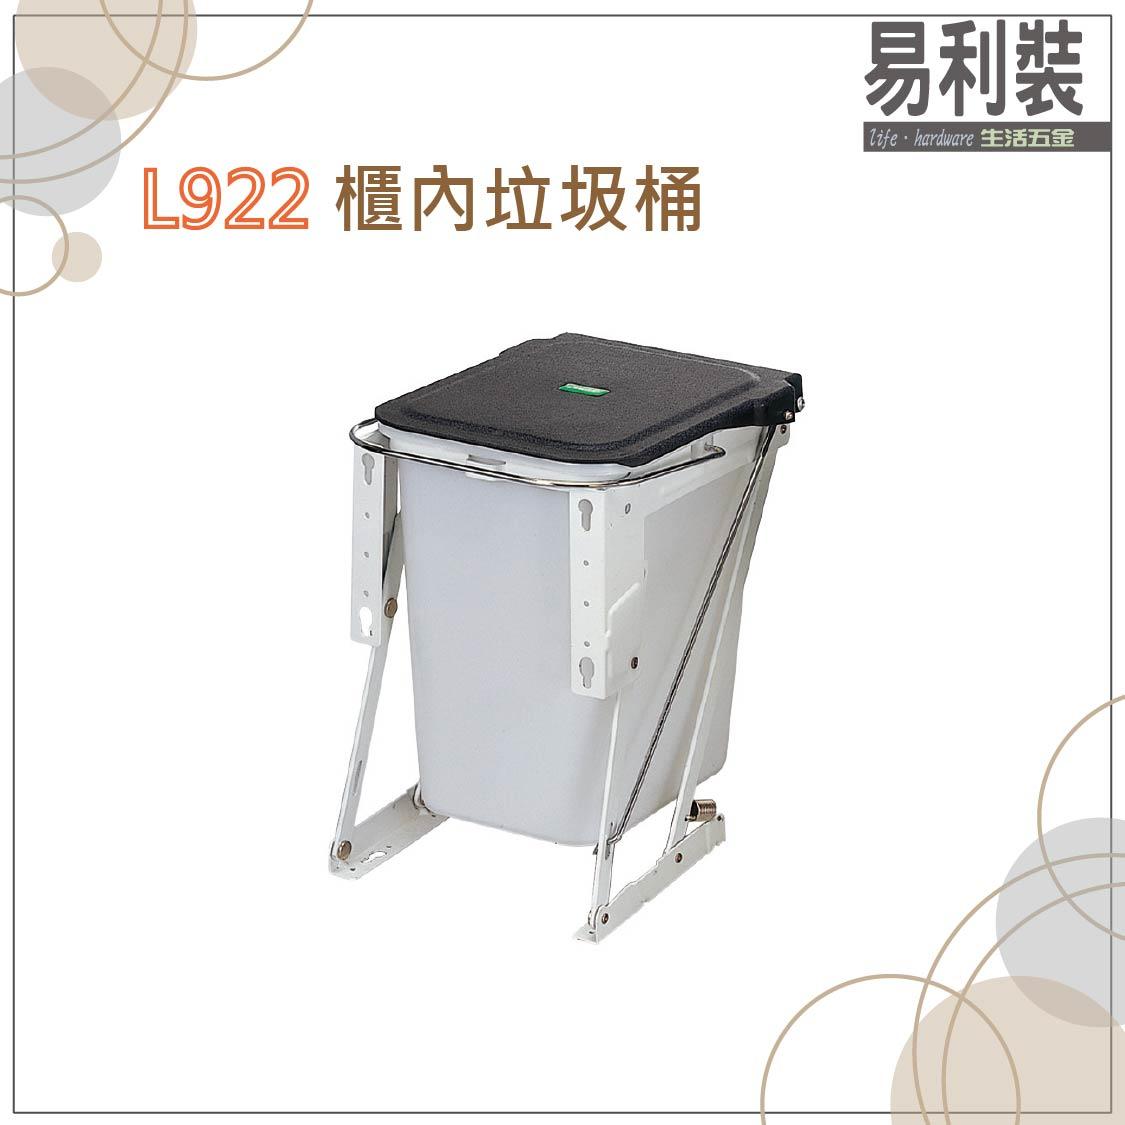 【 EASYCAN 】L922 櫃內垃圾桶 易利裝生活五金 廚房清潔桶 垃圾桶 房間 臥房 衣櫃 小資族 辦公家具 系統家具 0